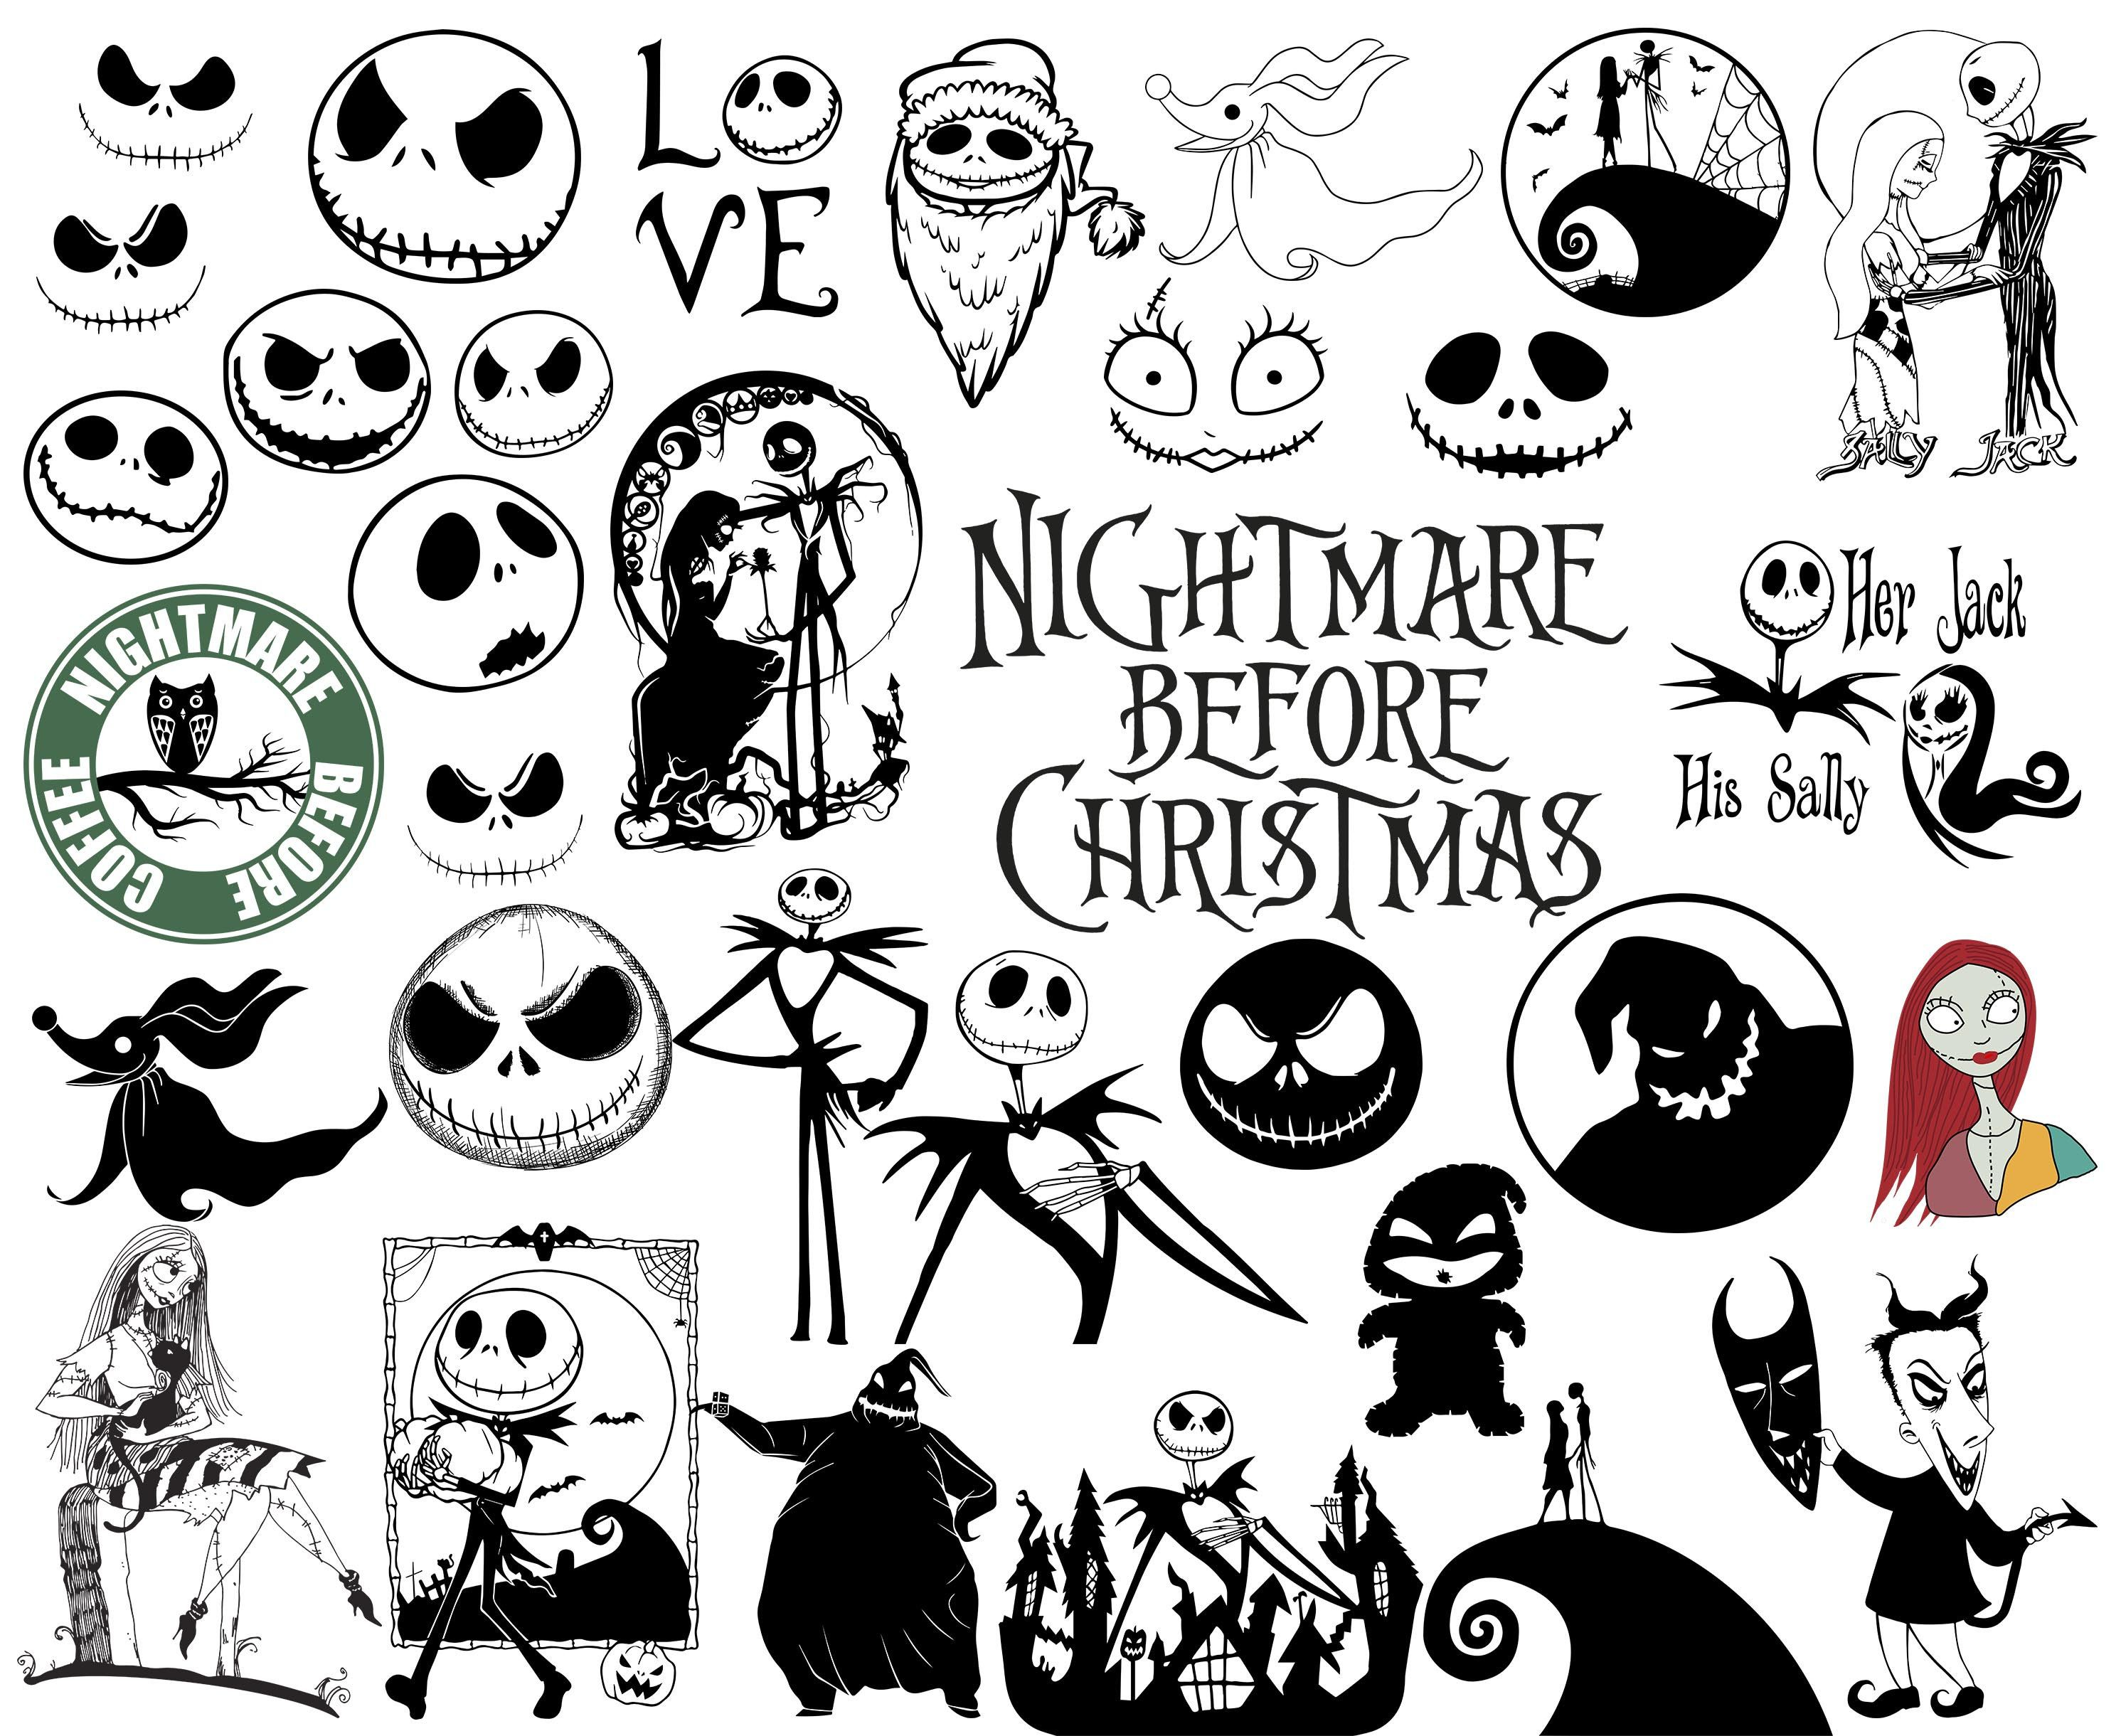 Nightmare Before Christmas Svg Christmas Svg Nightmare Svg Etsy Nightmare Before Christmas Tattoo Christmas Tattoo Nightmare Before Christmas Ornaments